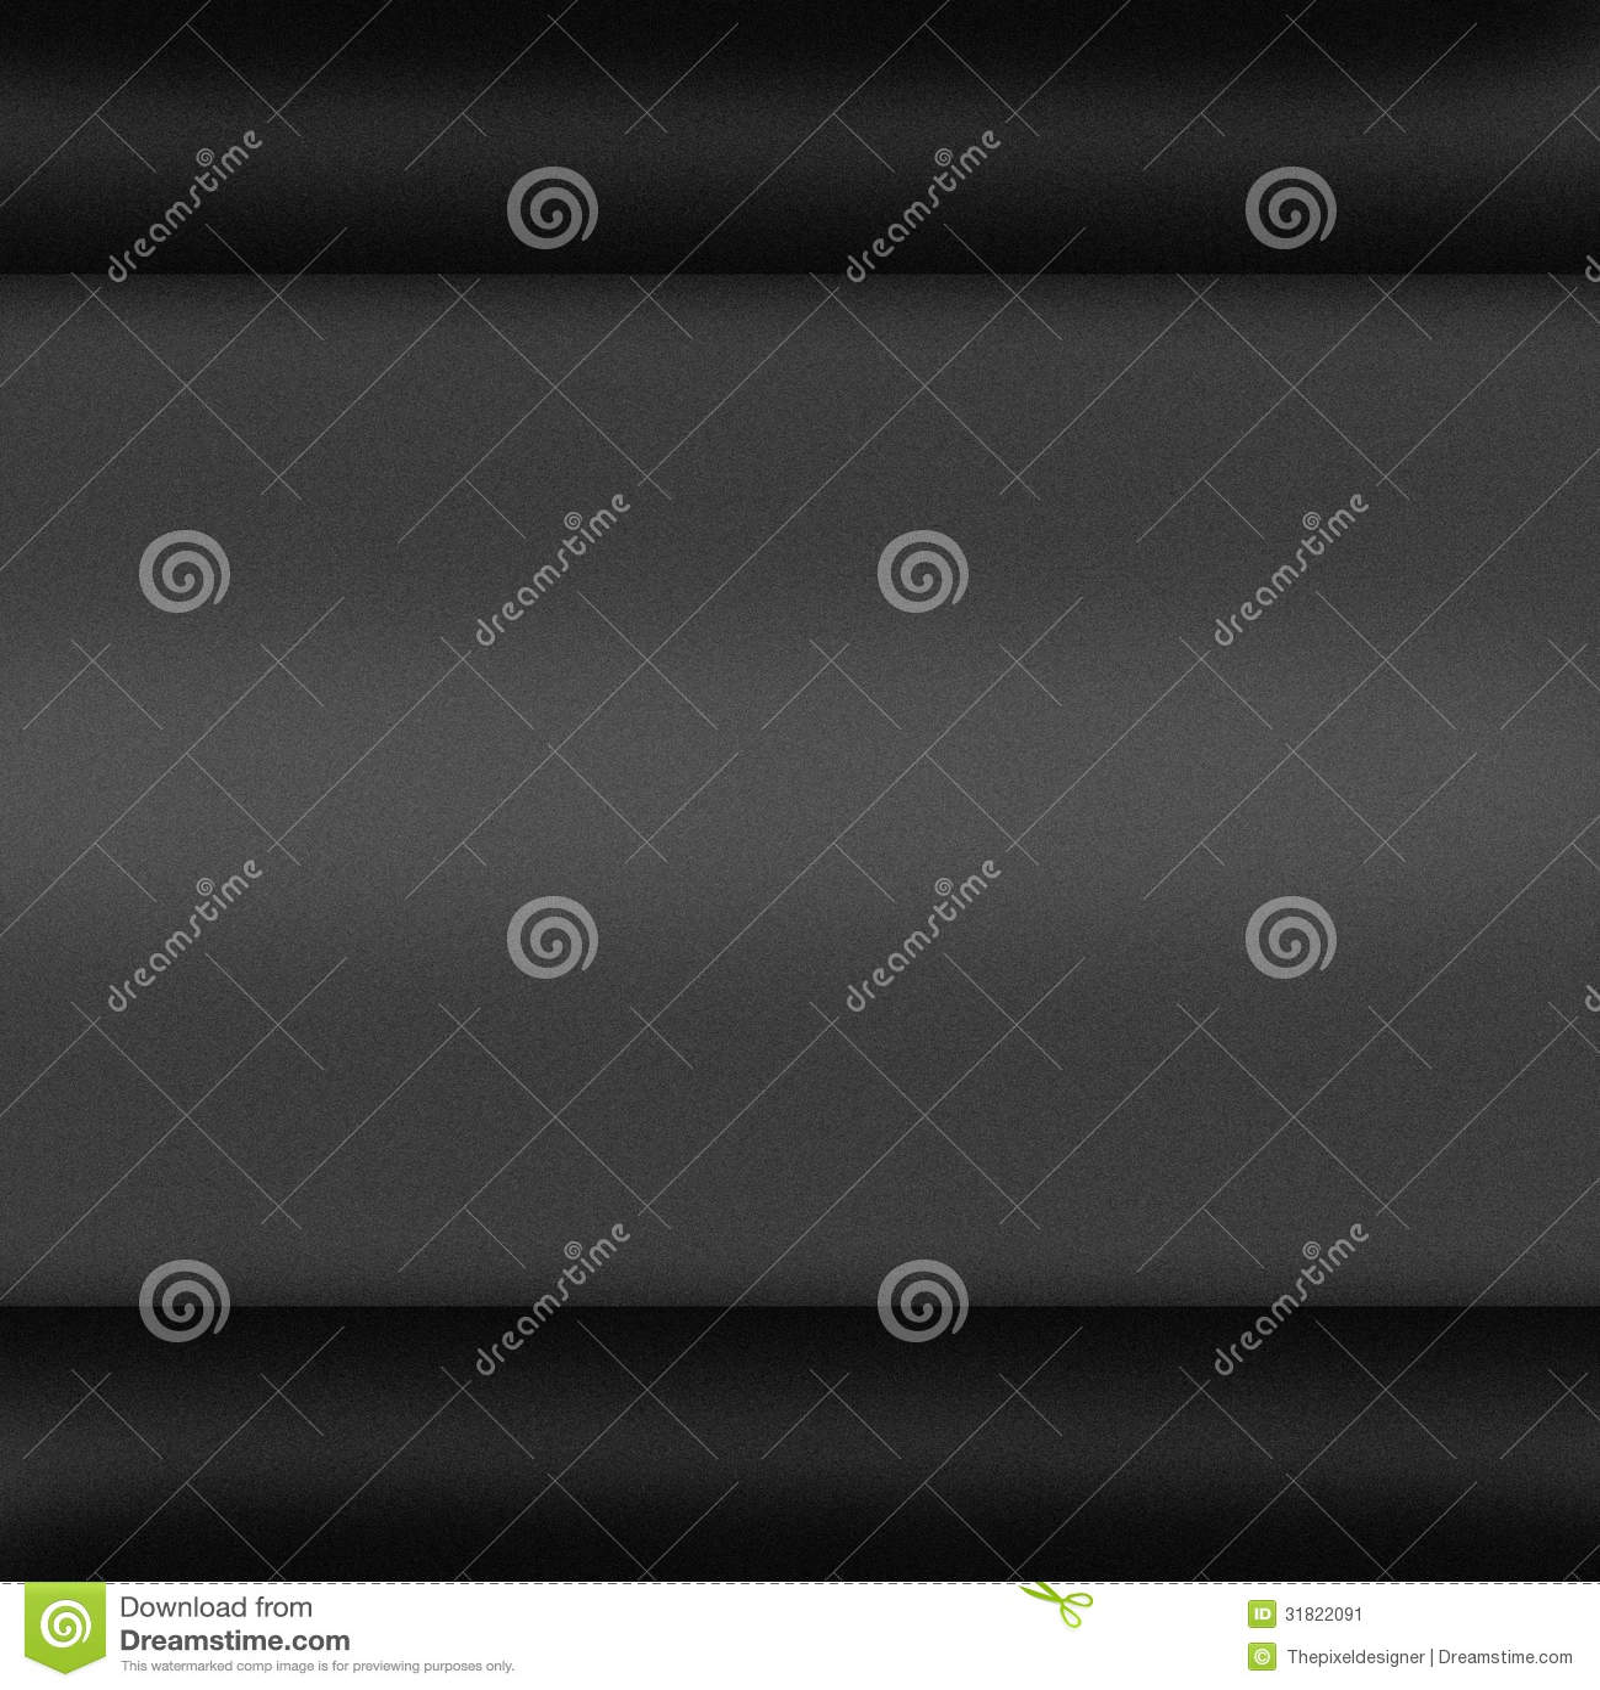 Black, Dark, Grey Background Stock Image